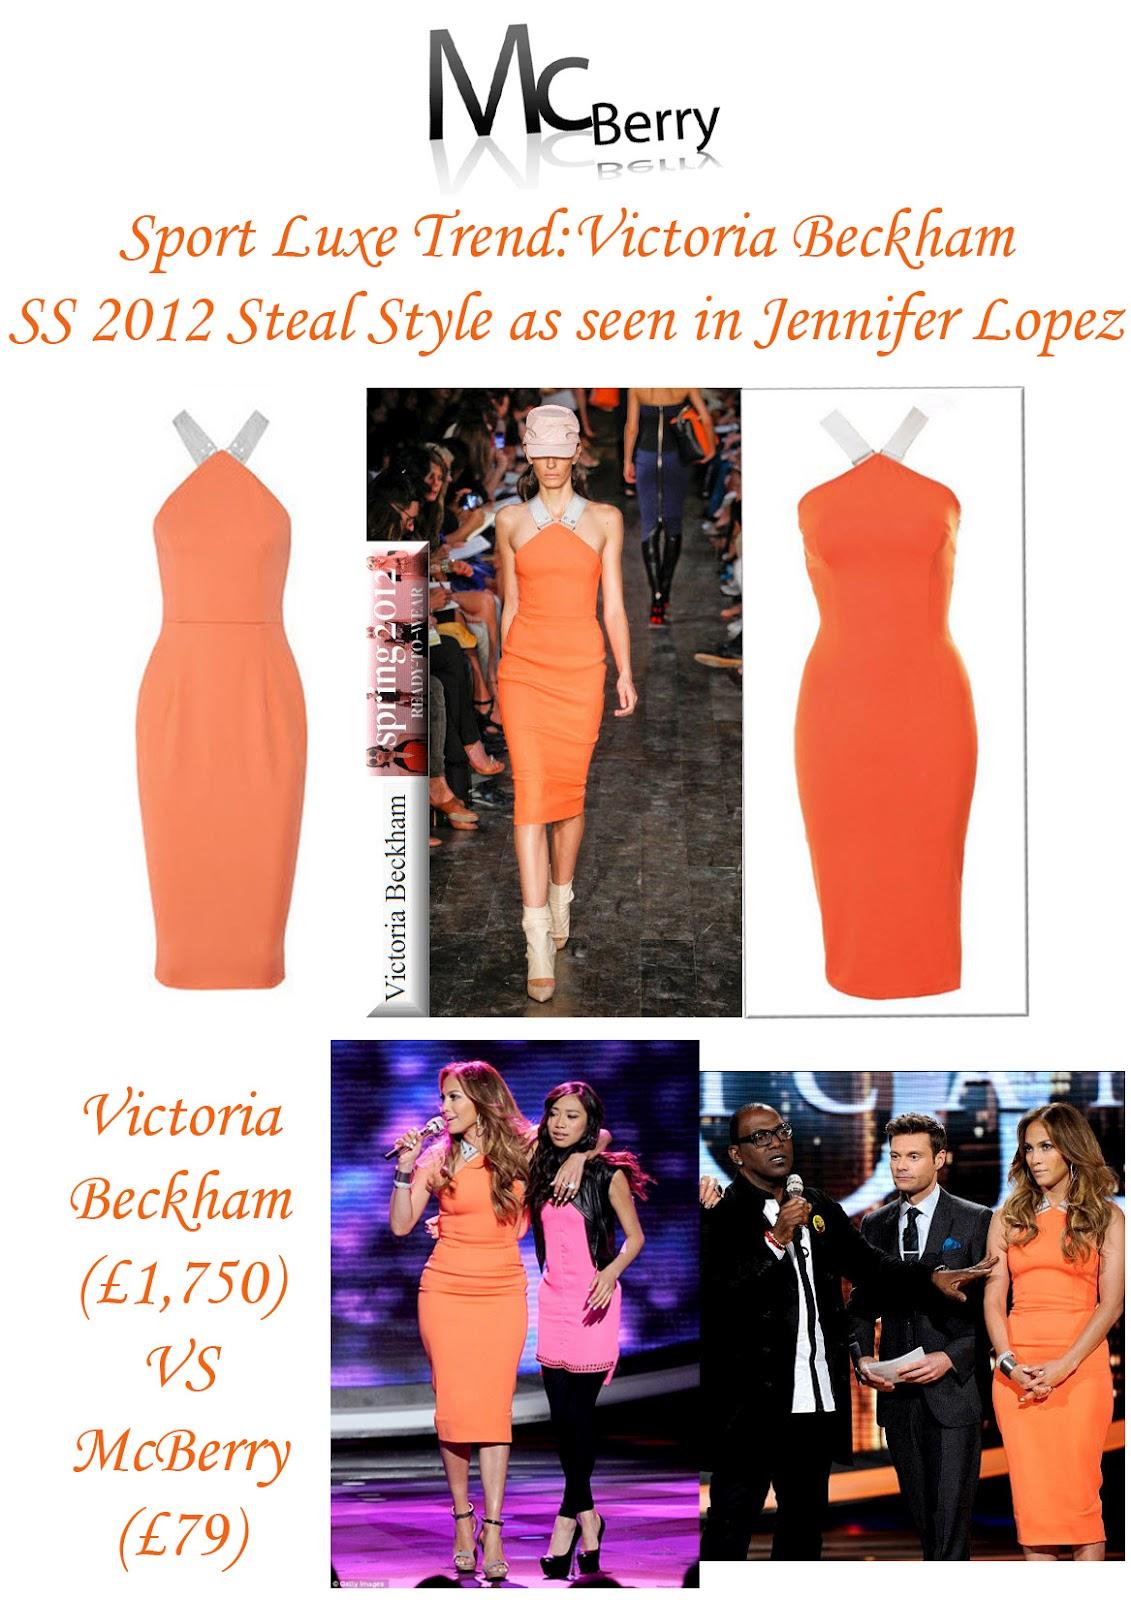 http://3.bp.blogspot.com/-7fCcrB8hZbA/T7uTnodlI7I/AAAAAAAAAZw/WYvkBHSv4bQ/s1600/Looksheet_Victoria+Beckham+Asymmetric+strappy+dress.jpg